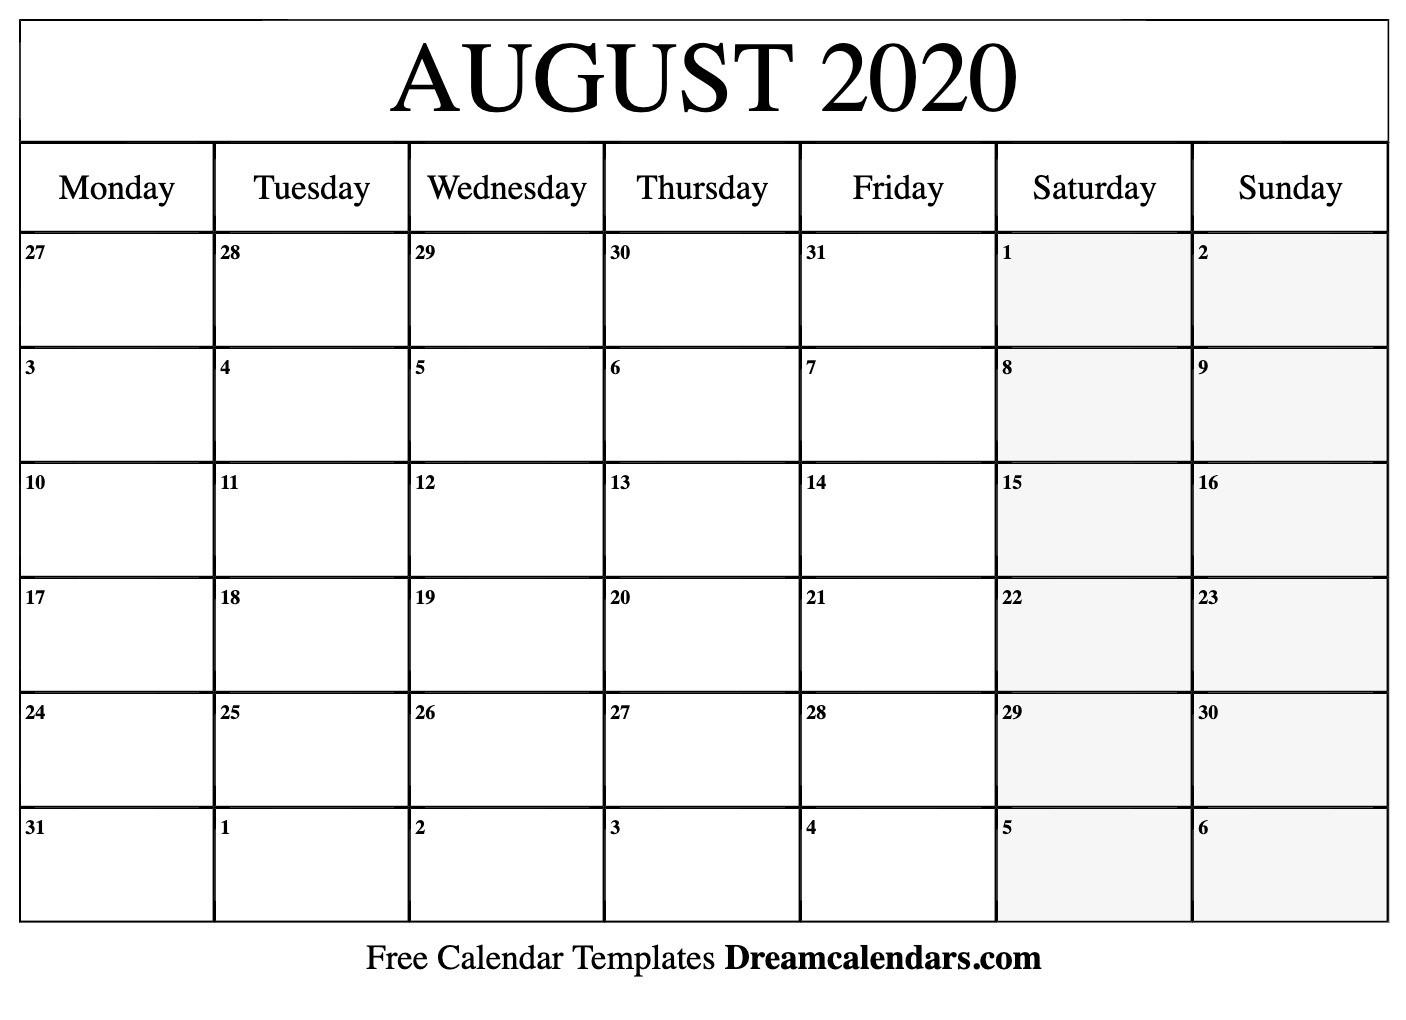 Printable August 2020 Calendar Templates - Helena Orstem